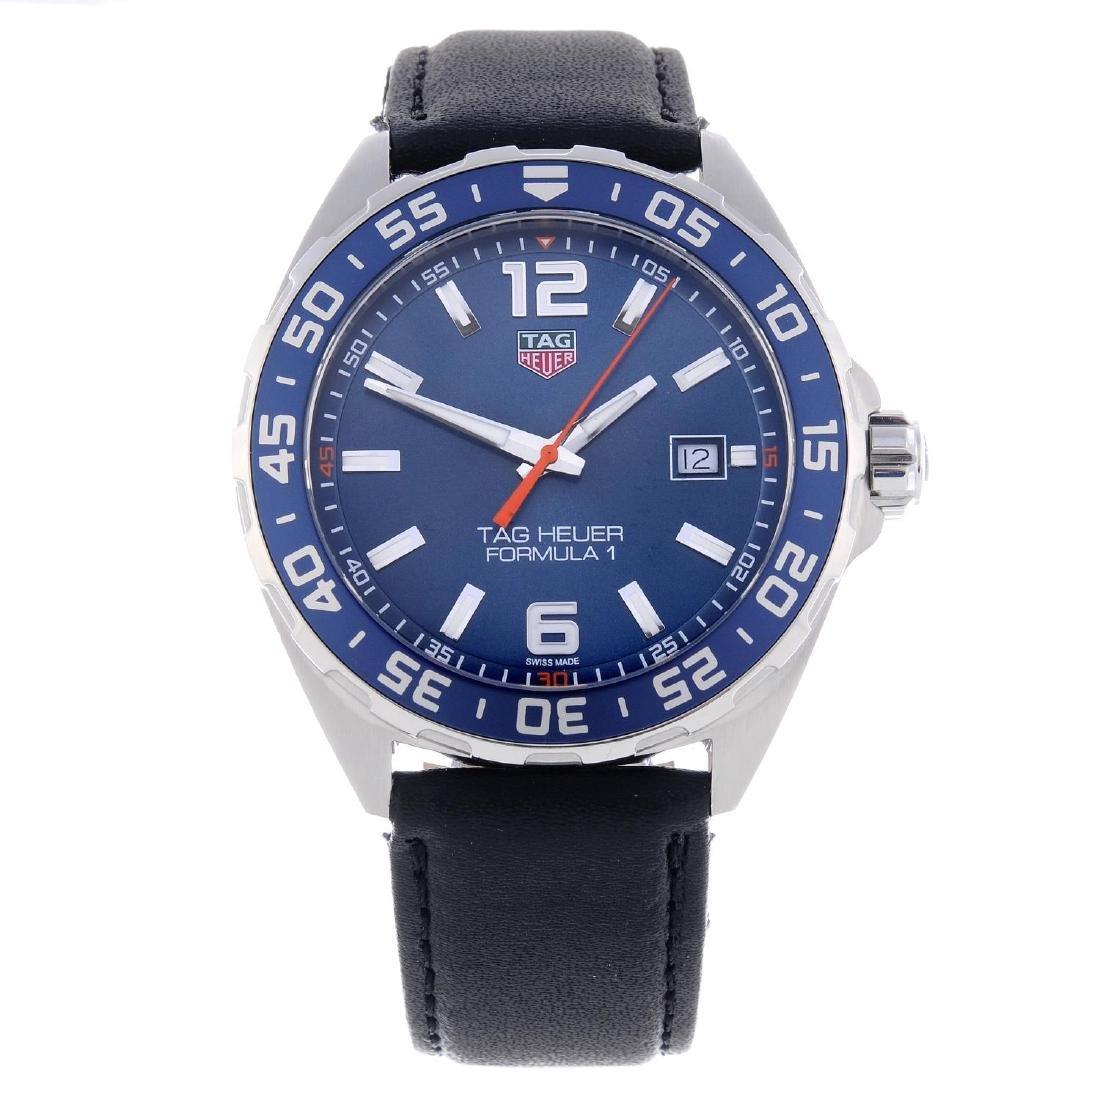 TAG HEUER - a gentleman's Formula 1 wrist watch.